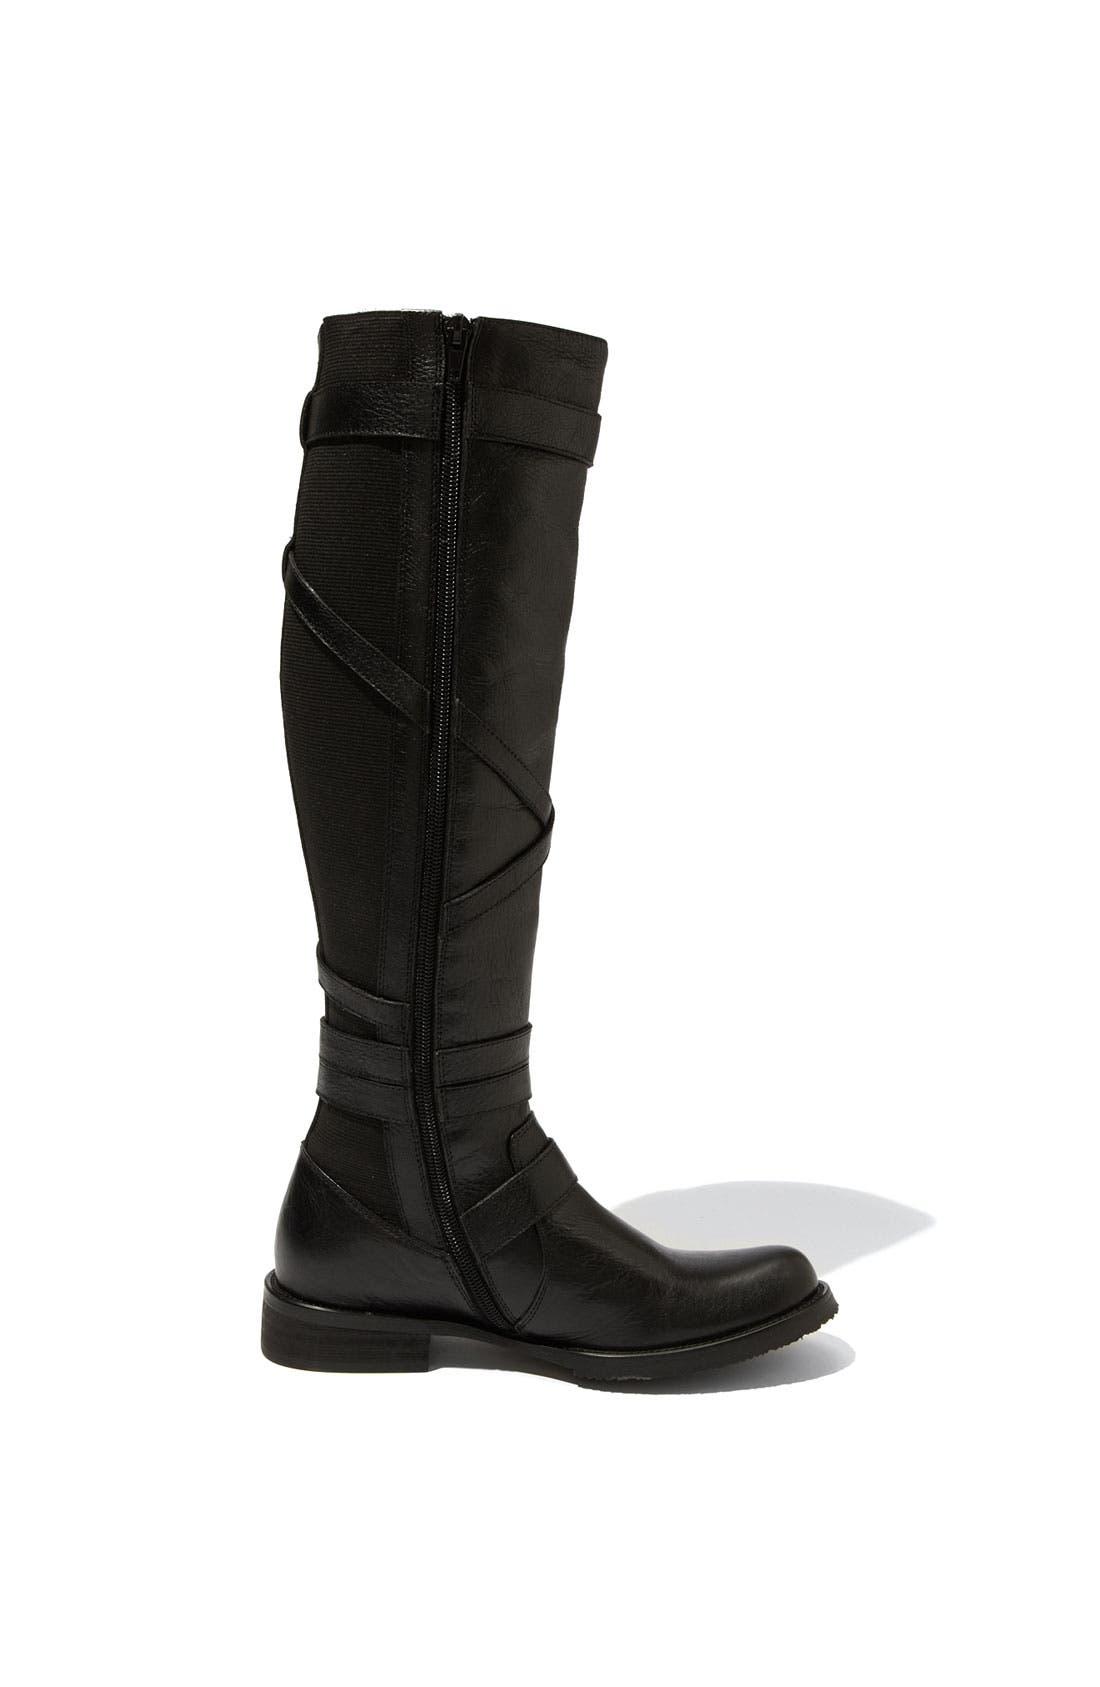 Alternate Image 2  - Miz Mooz 'Kira' Riding Boot